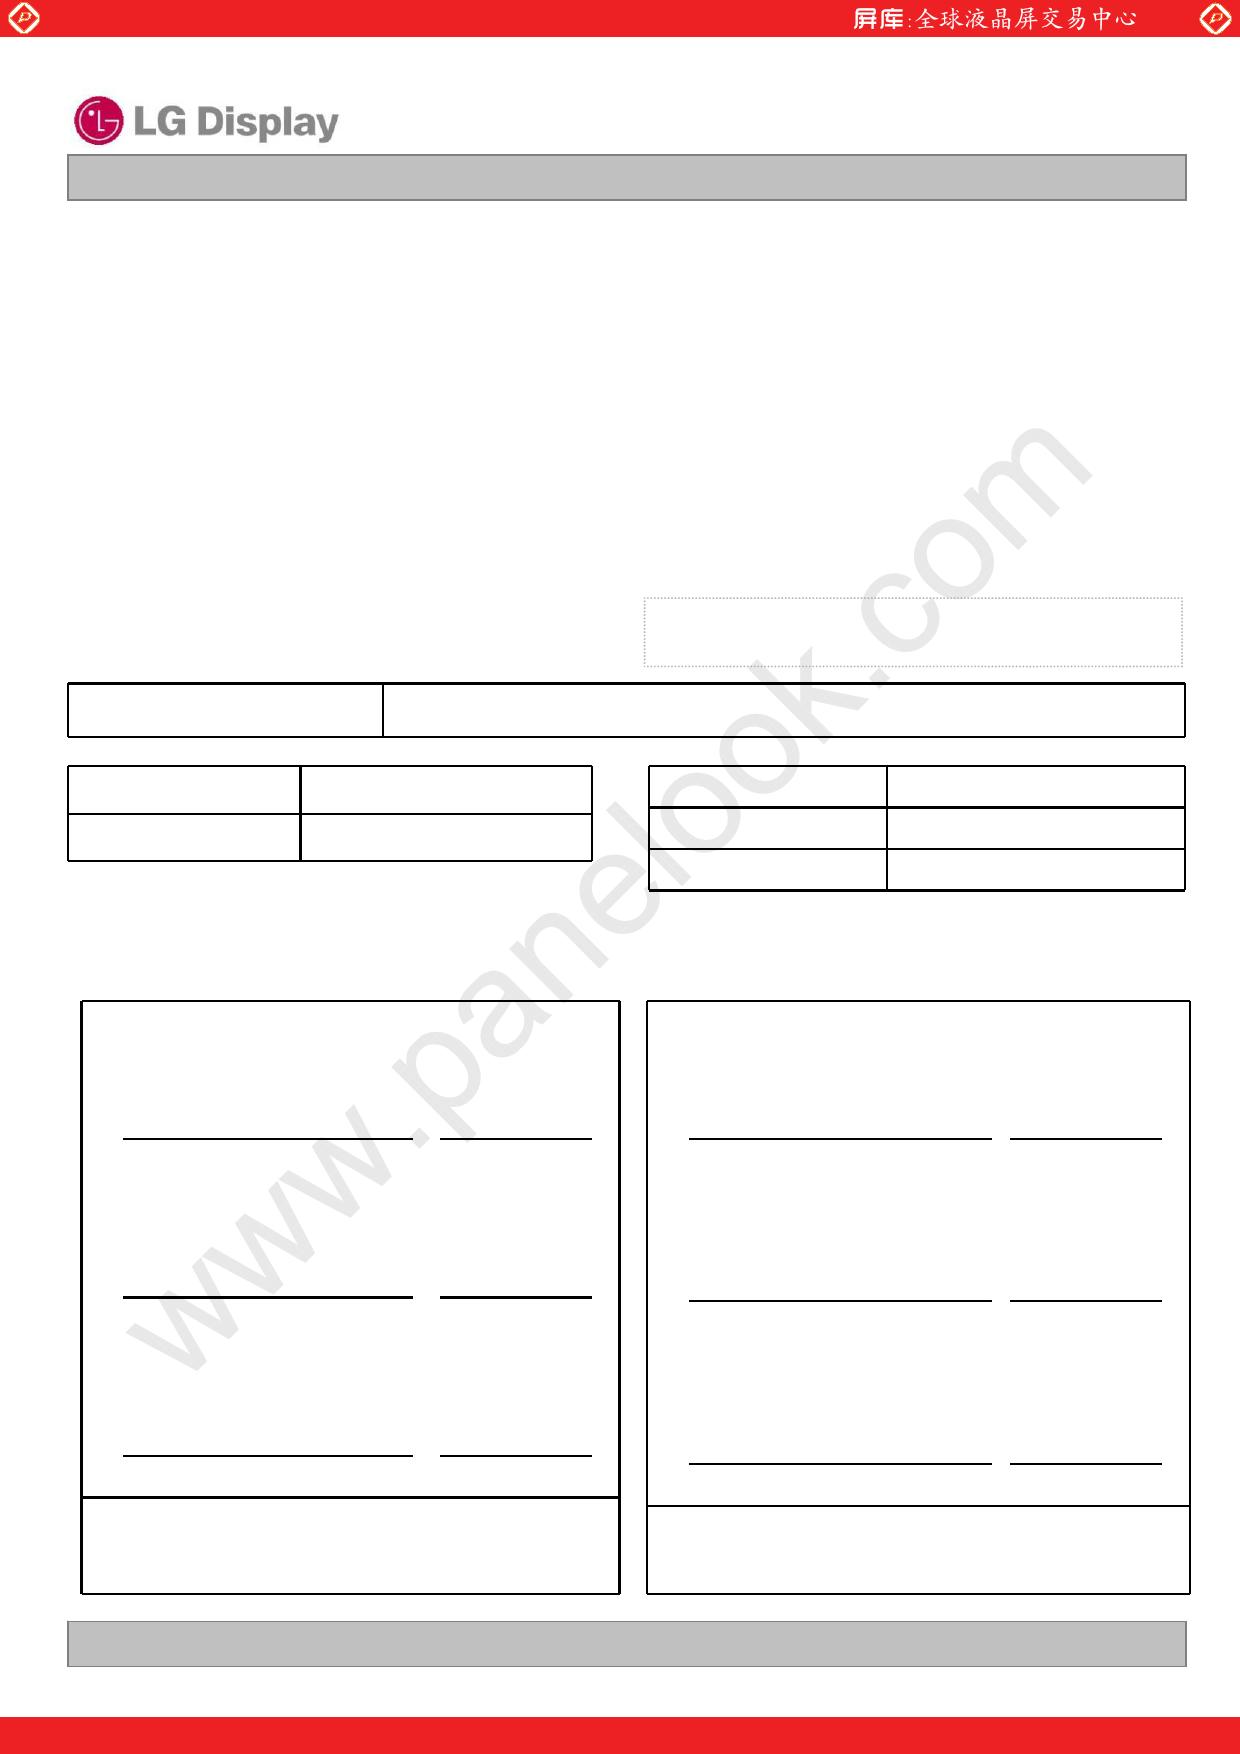 LC320WXN-SBD1 datasheet